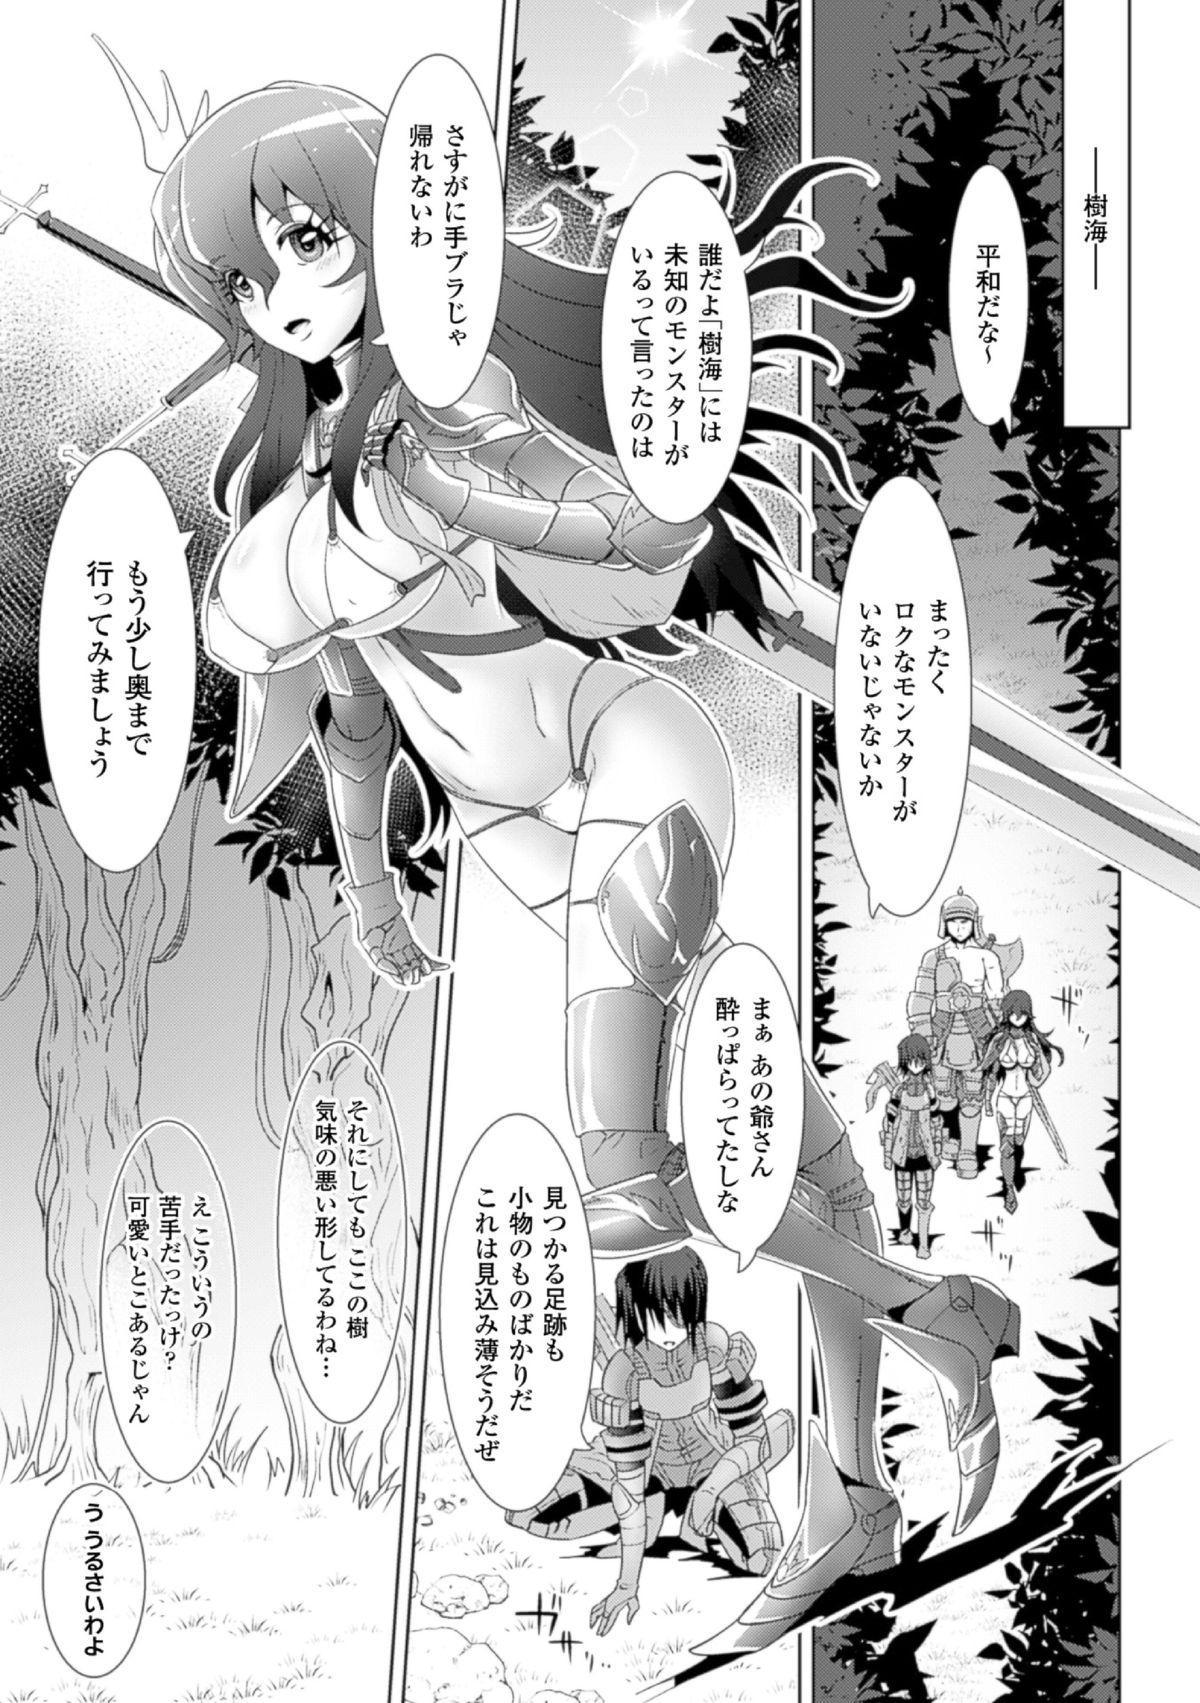 2D Comic Magazine Hunter Heroine AntholoG Vol.1 44